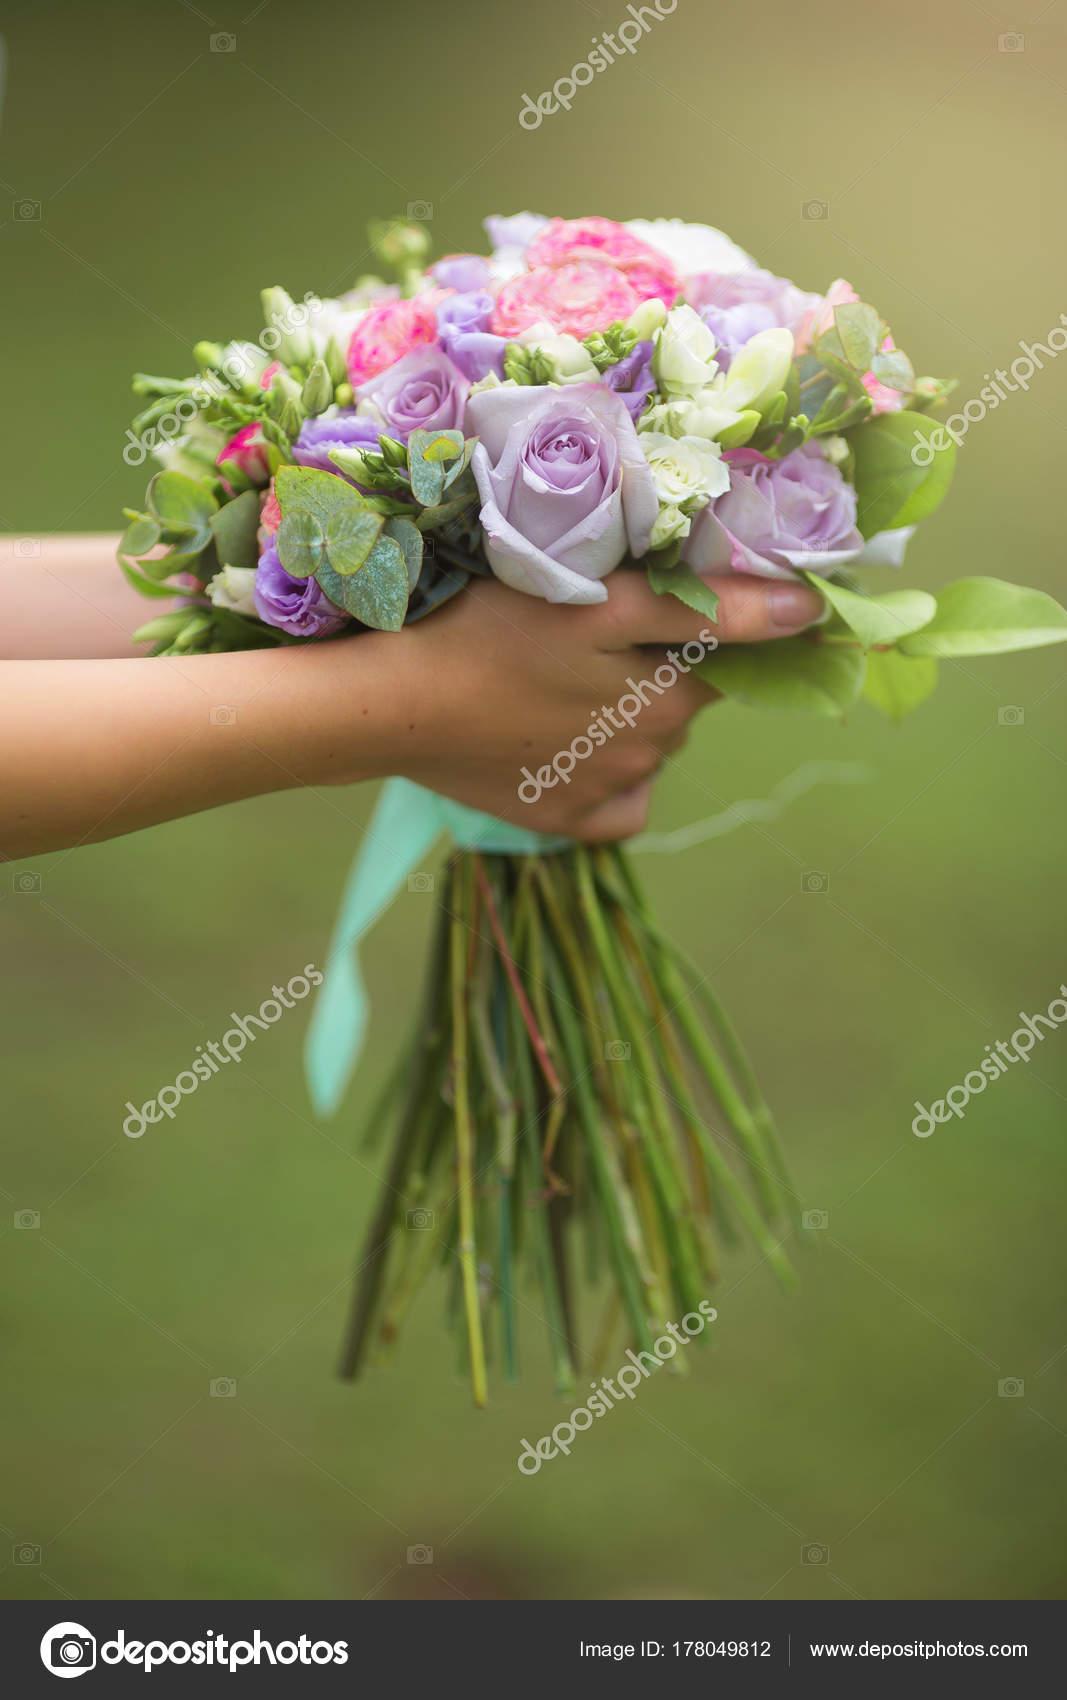 Beautiful stylish wedding bouquet fresh flowers hands bride wedding beautiful stylish wedding bouquet fresh flowers hands bride wedding day stock photo izmirmasajfo